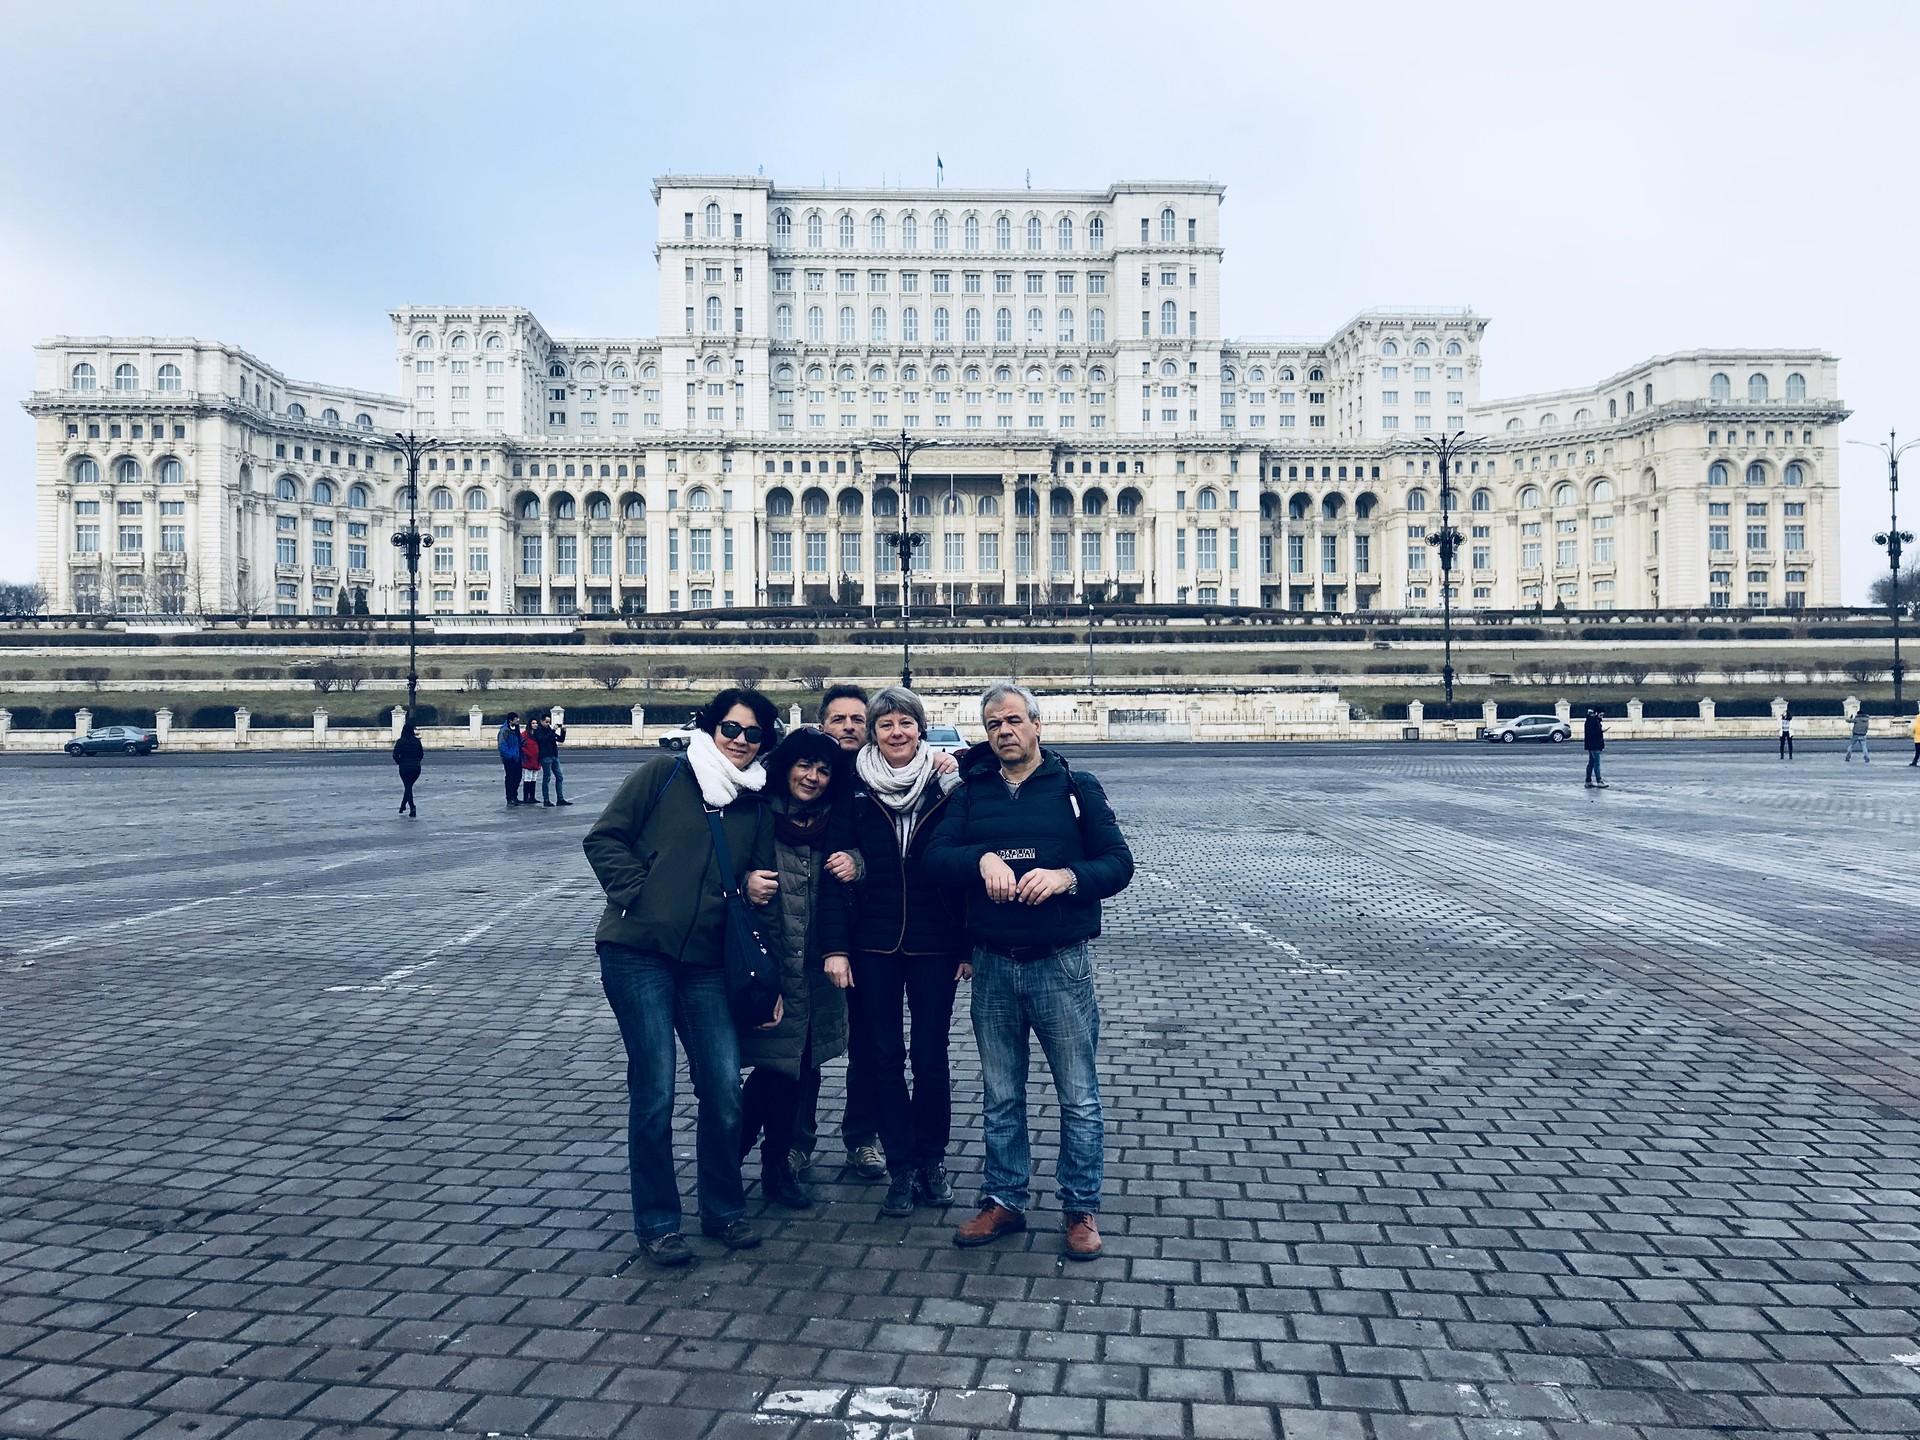 palazzo-parlamento-bucarest-8de185300b92